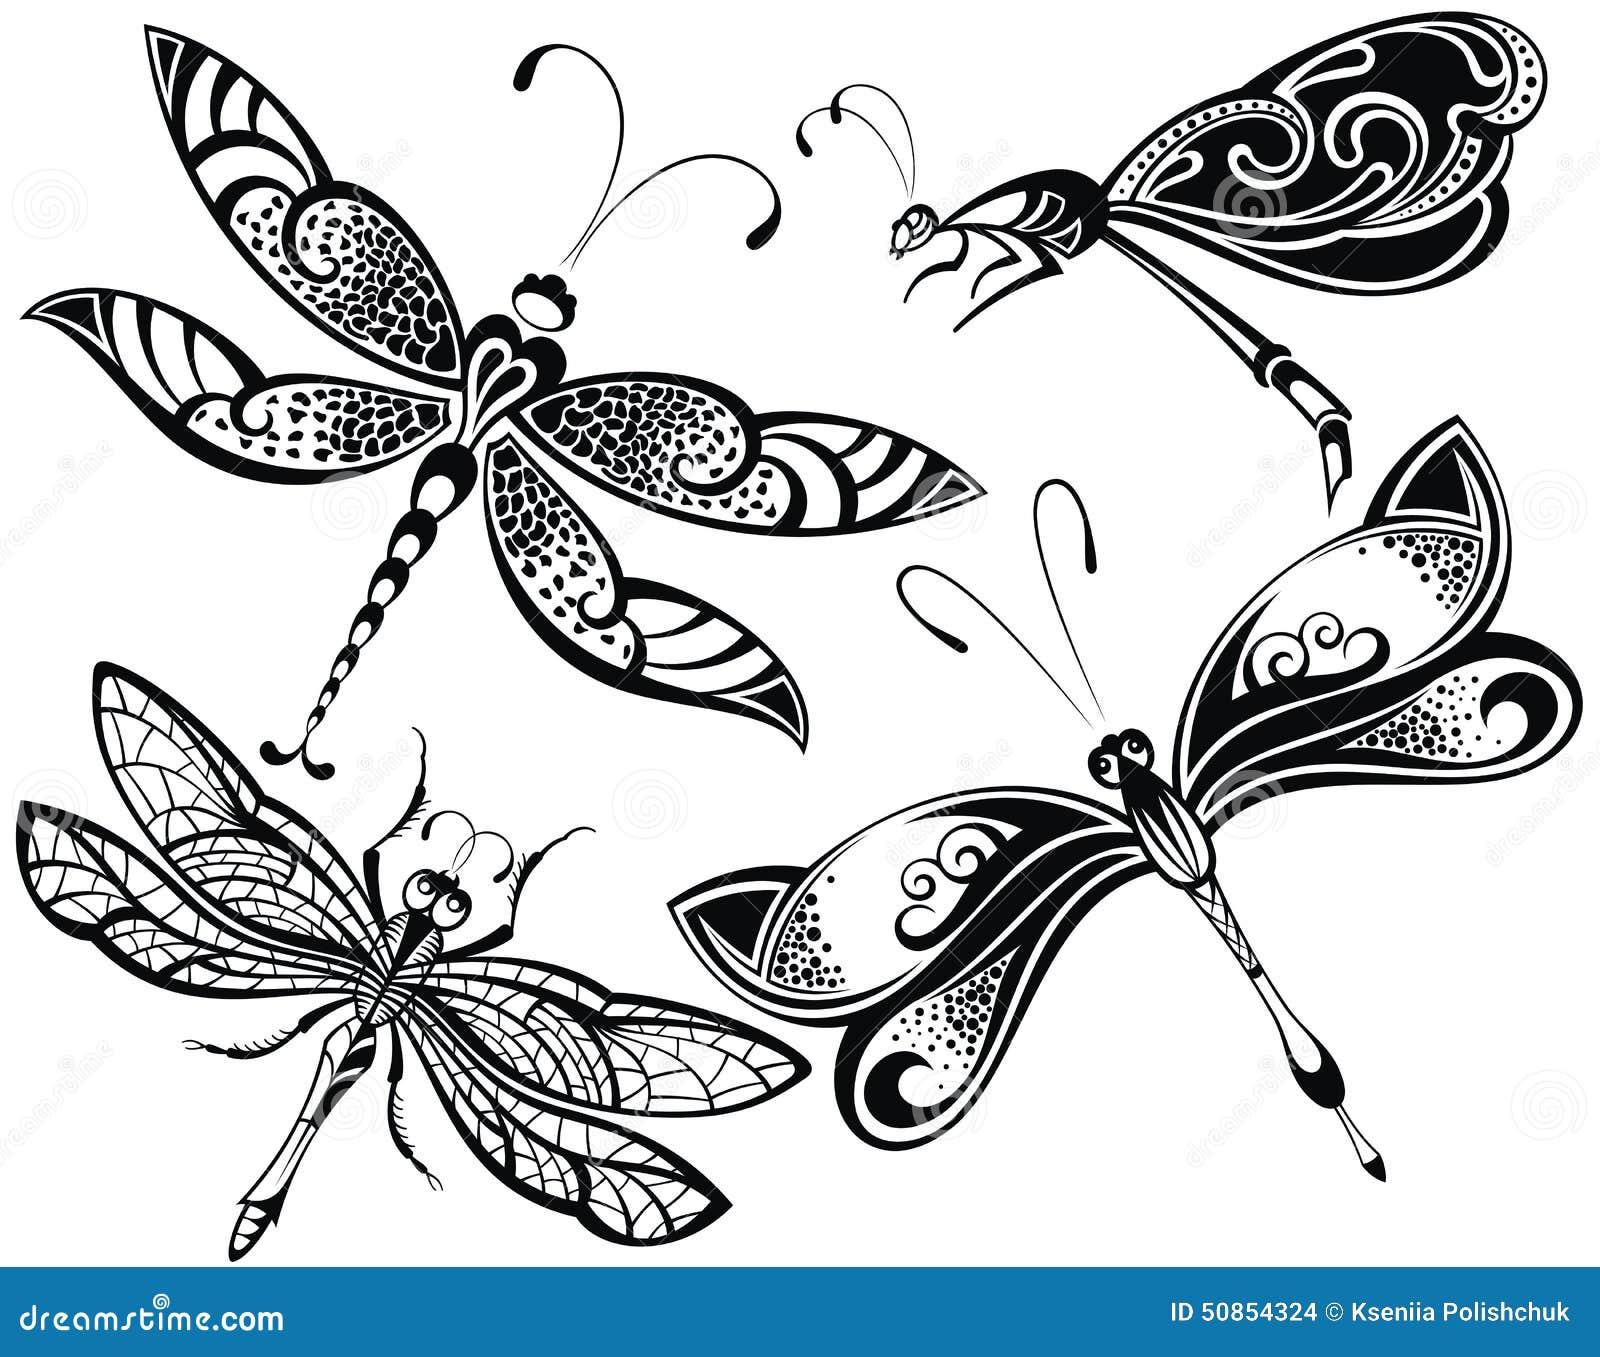 Dragonfly set stock vector illustration of image illustration dragonfly set stock vector illustration of image illustration 50854324 biocorpaavc